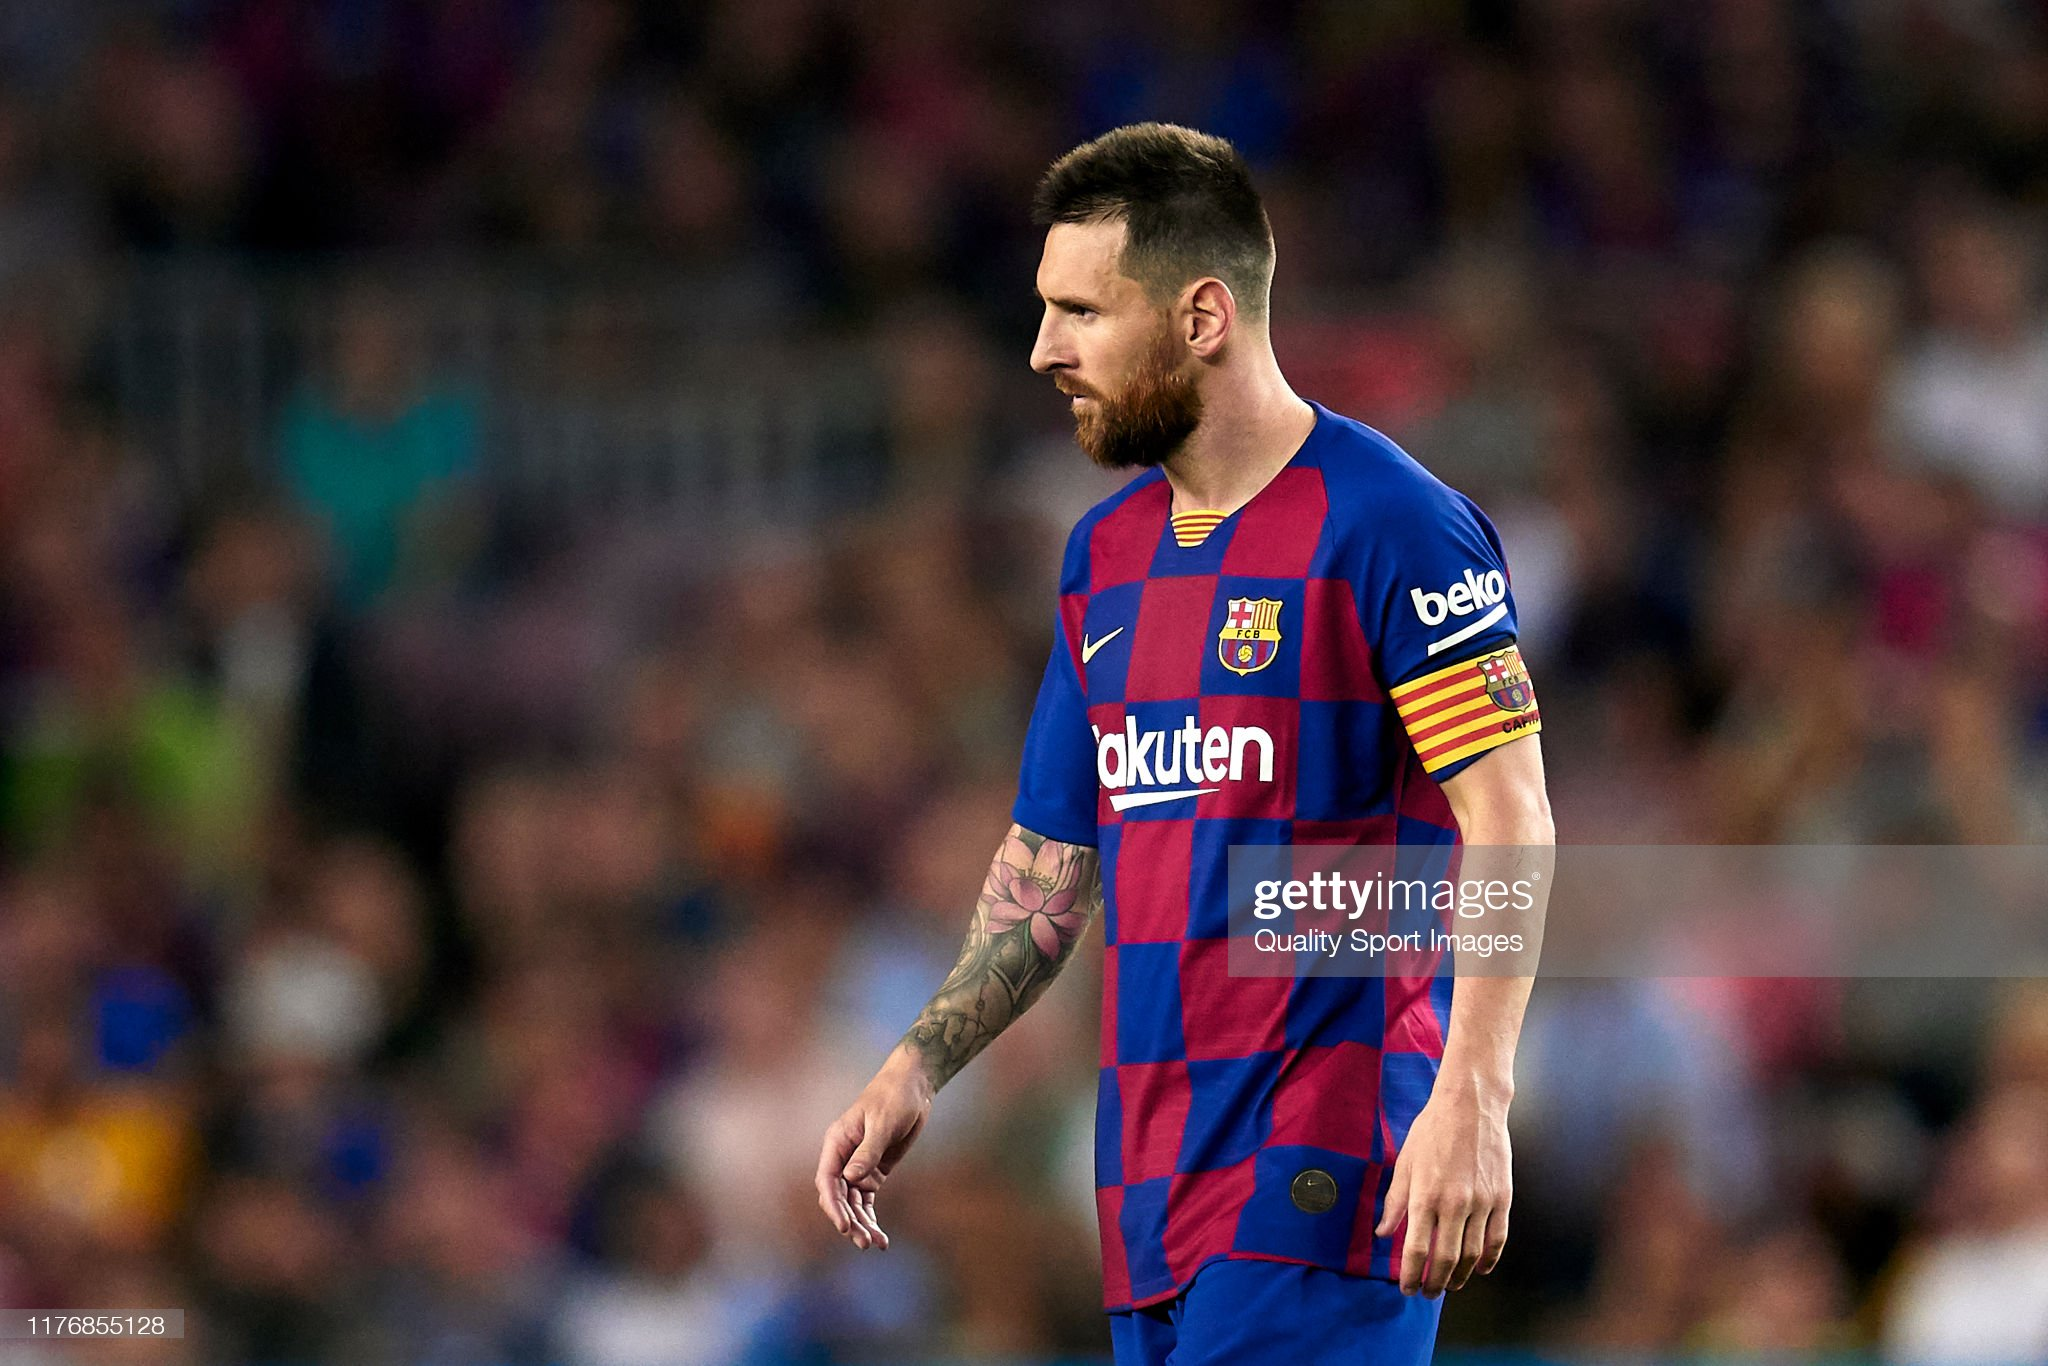 صور مباراة : برشلونة - فياريال 2-1 ( 24-09-2019 )  Lionel-messi-of-fc-barcelona-looks-on-during-the-liga-match-between-picture-id1176855128?s=2048x2048